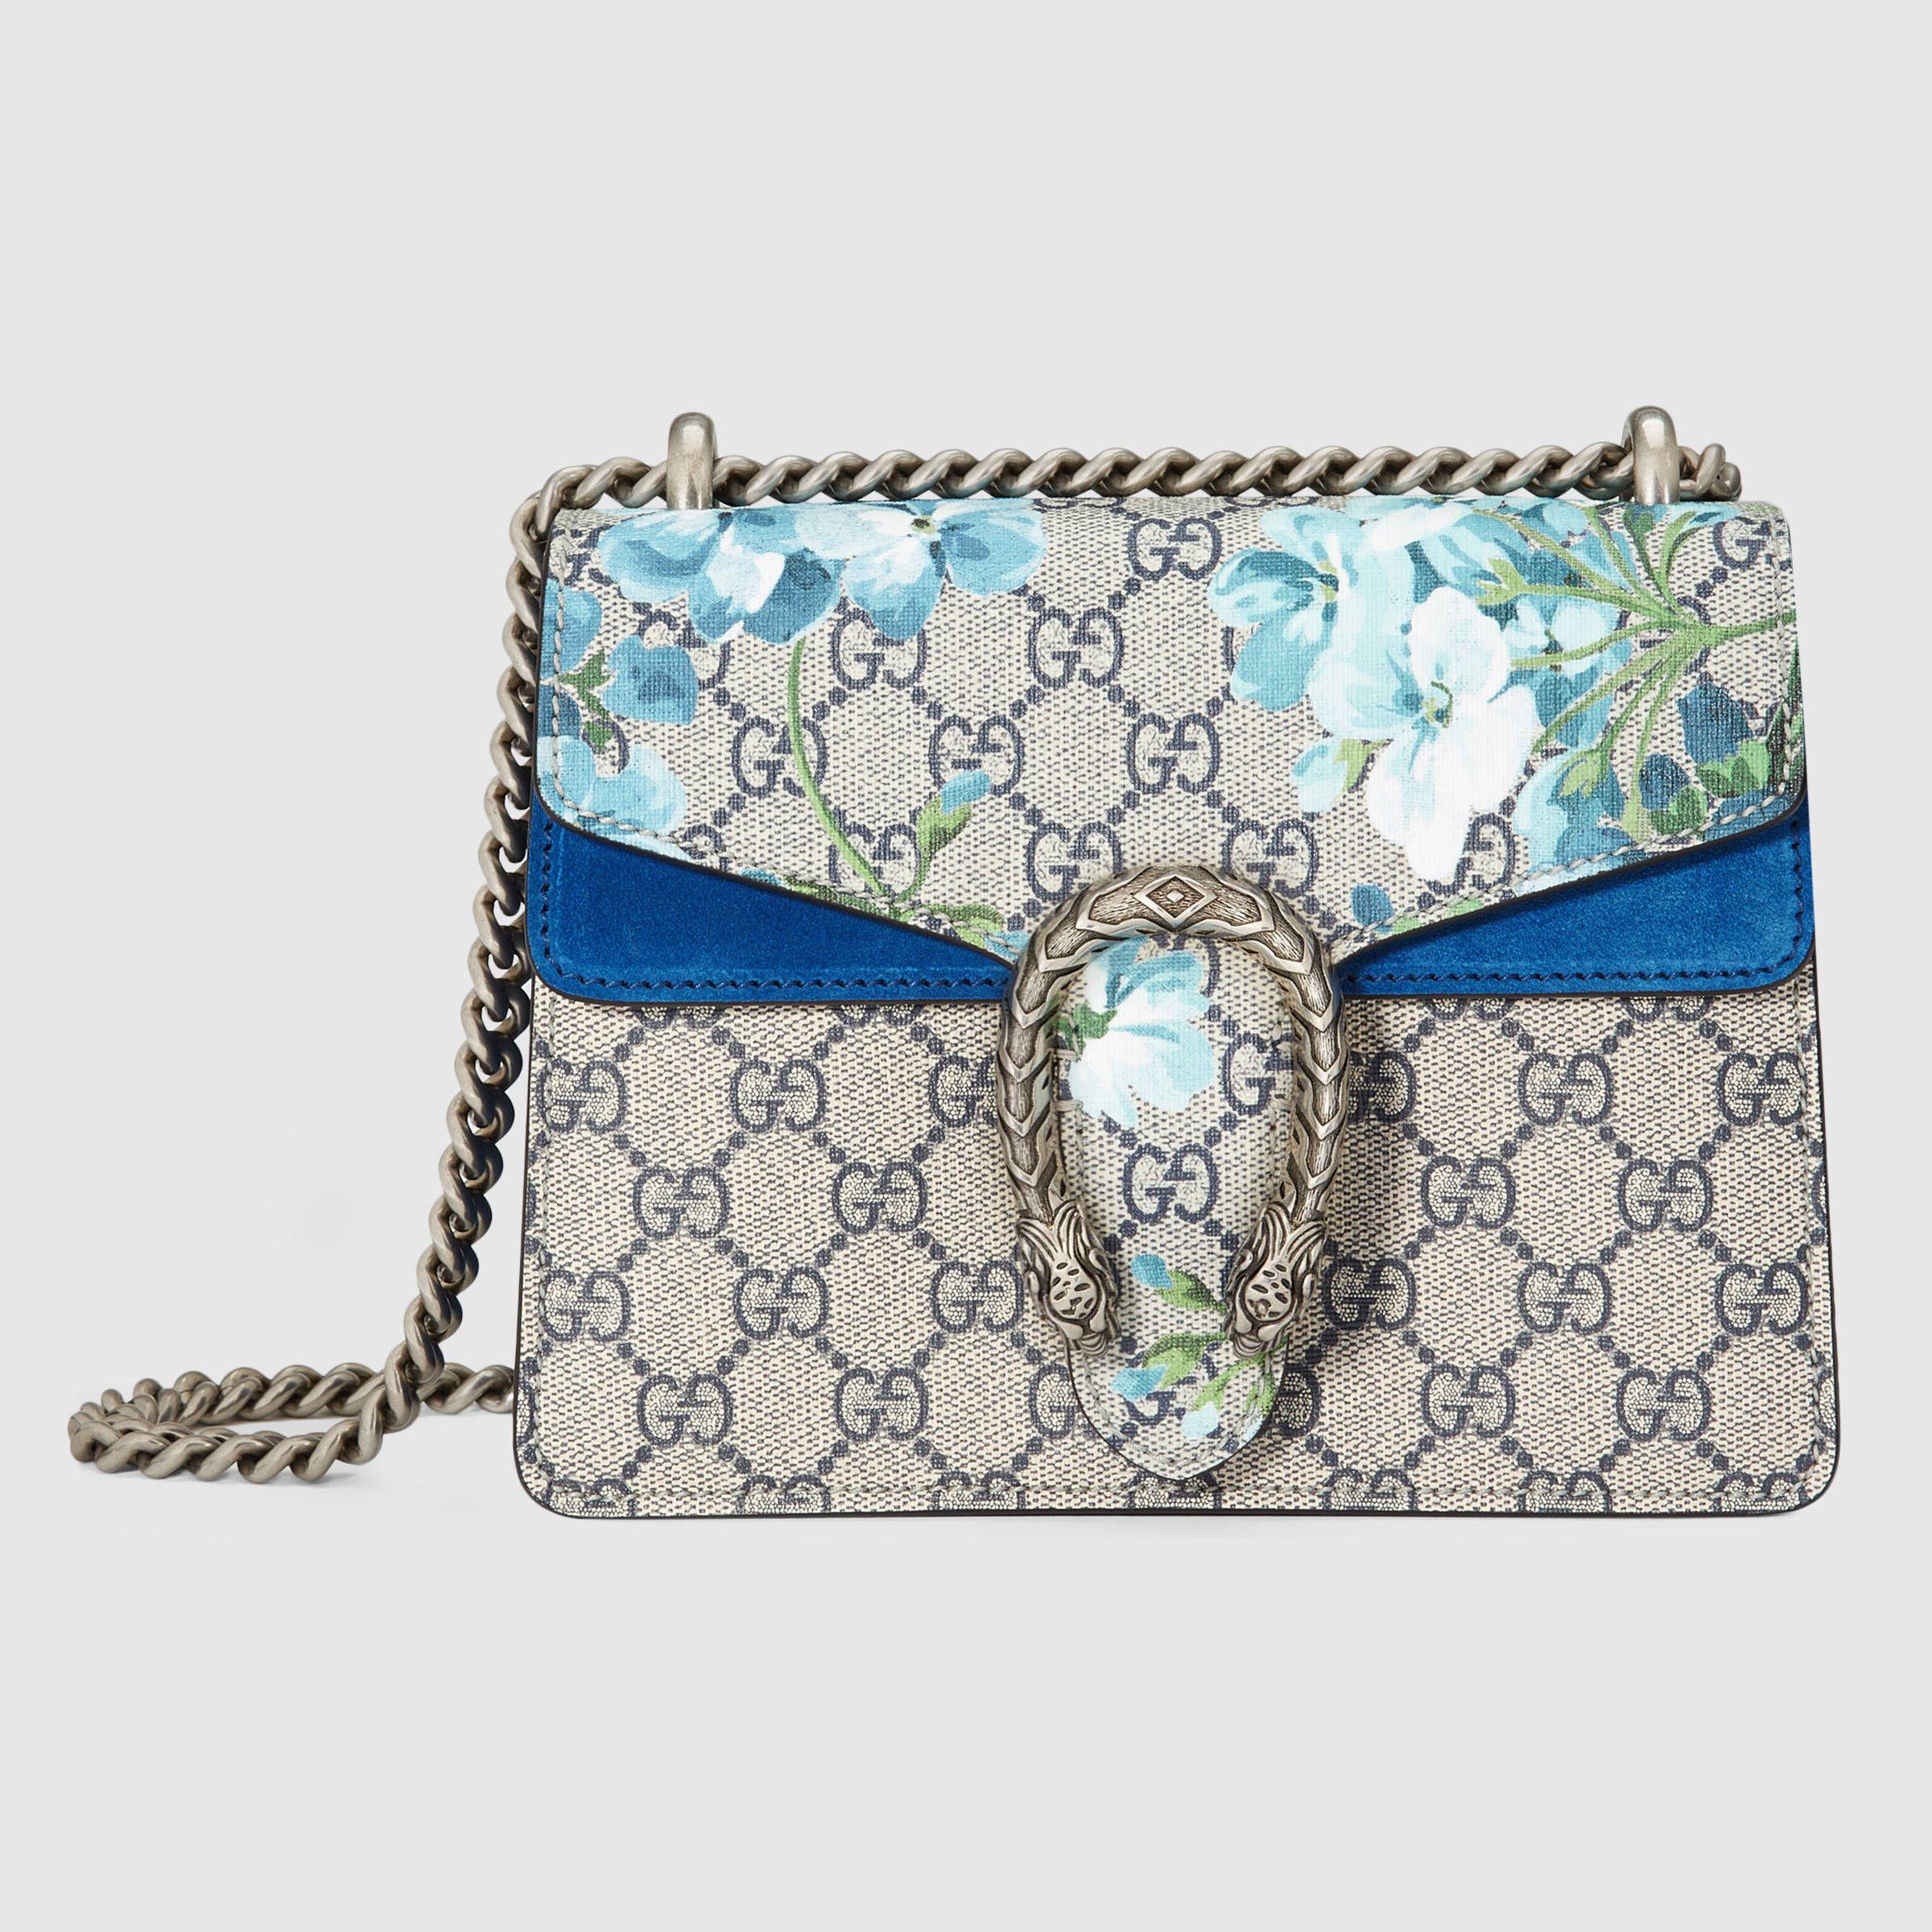 1cd07baac8e37 Dionysus GG Blooms mini bag